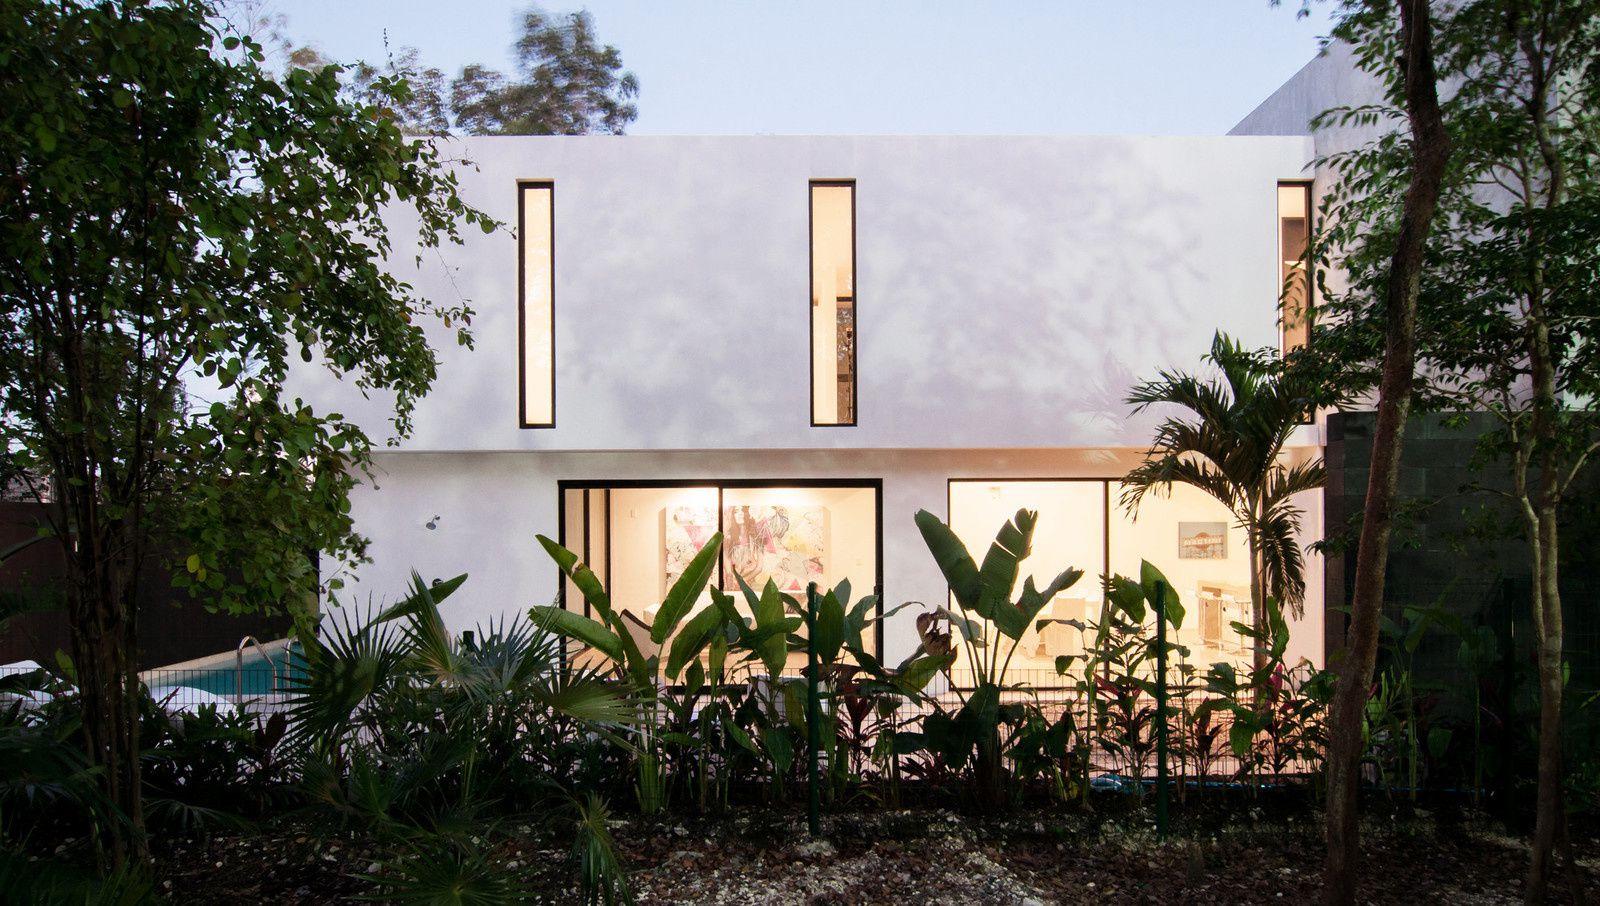 Garcias House - Warm Architects